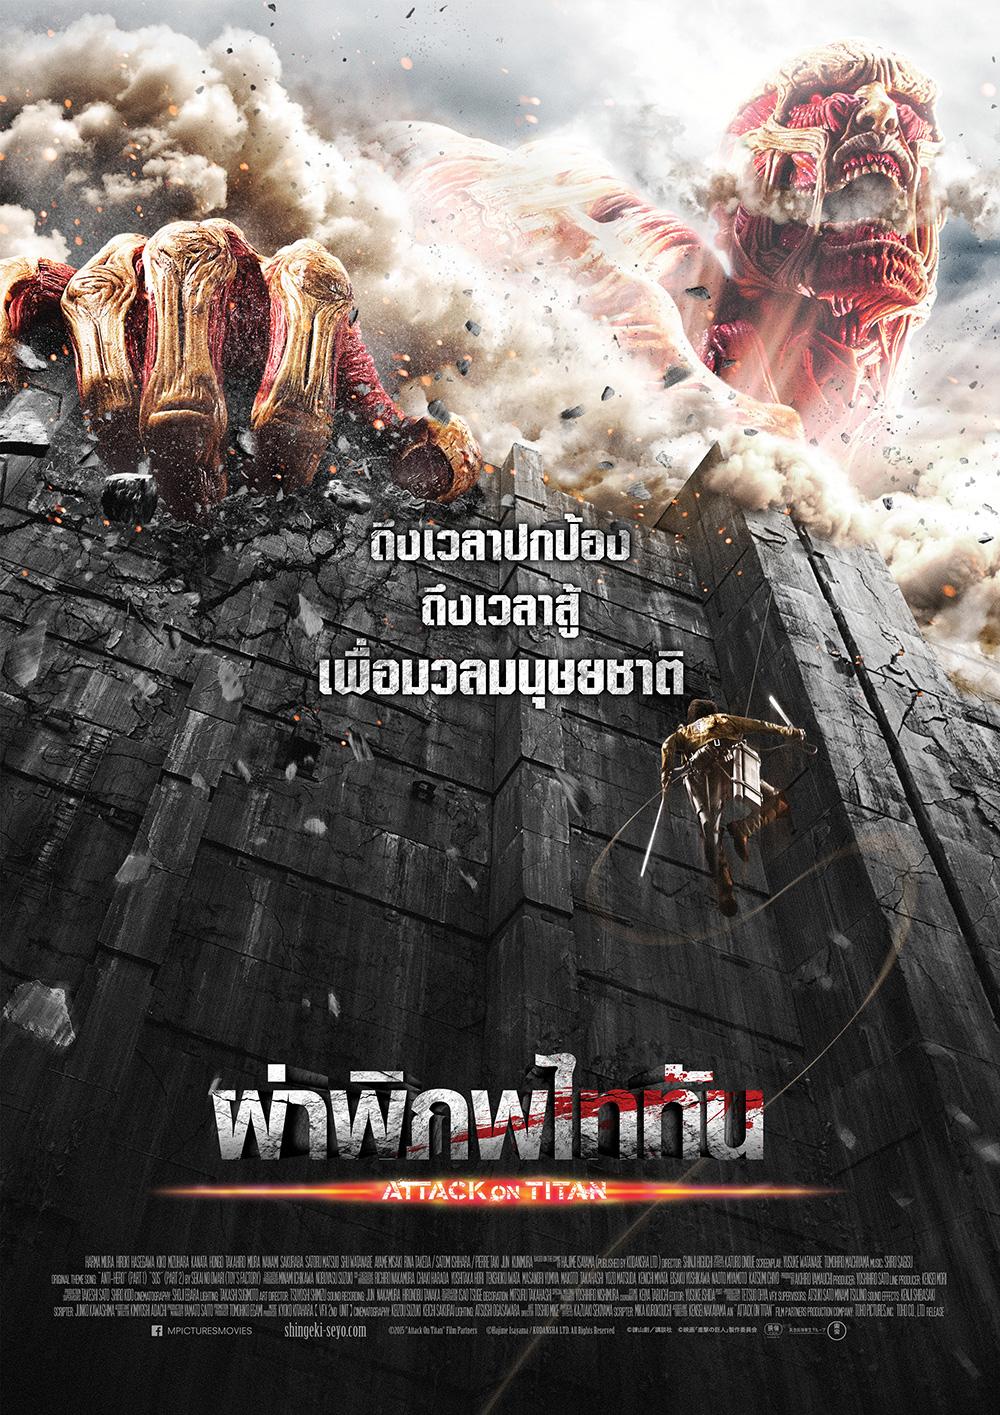 Attack on Titan Part : 1 (2015) ผ่าพิภพไททัน [ภาพ Master เสียงไทยโรง]